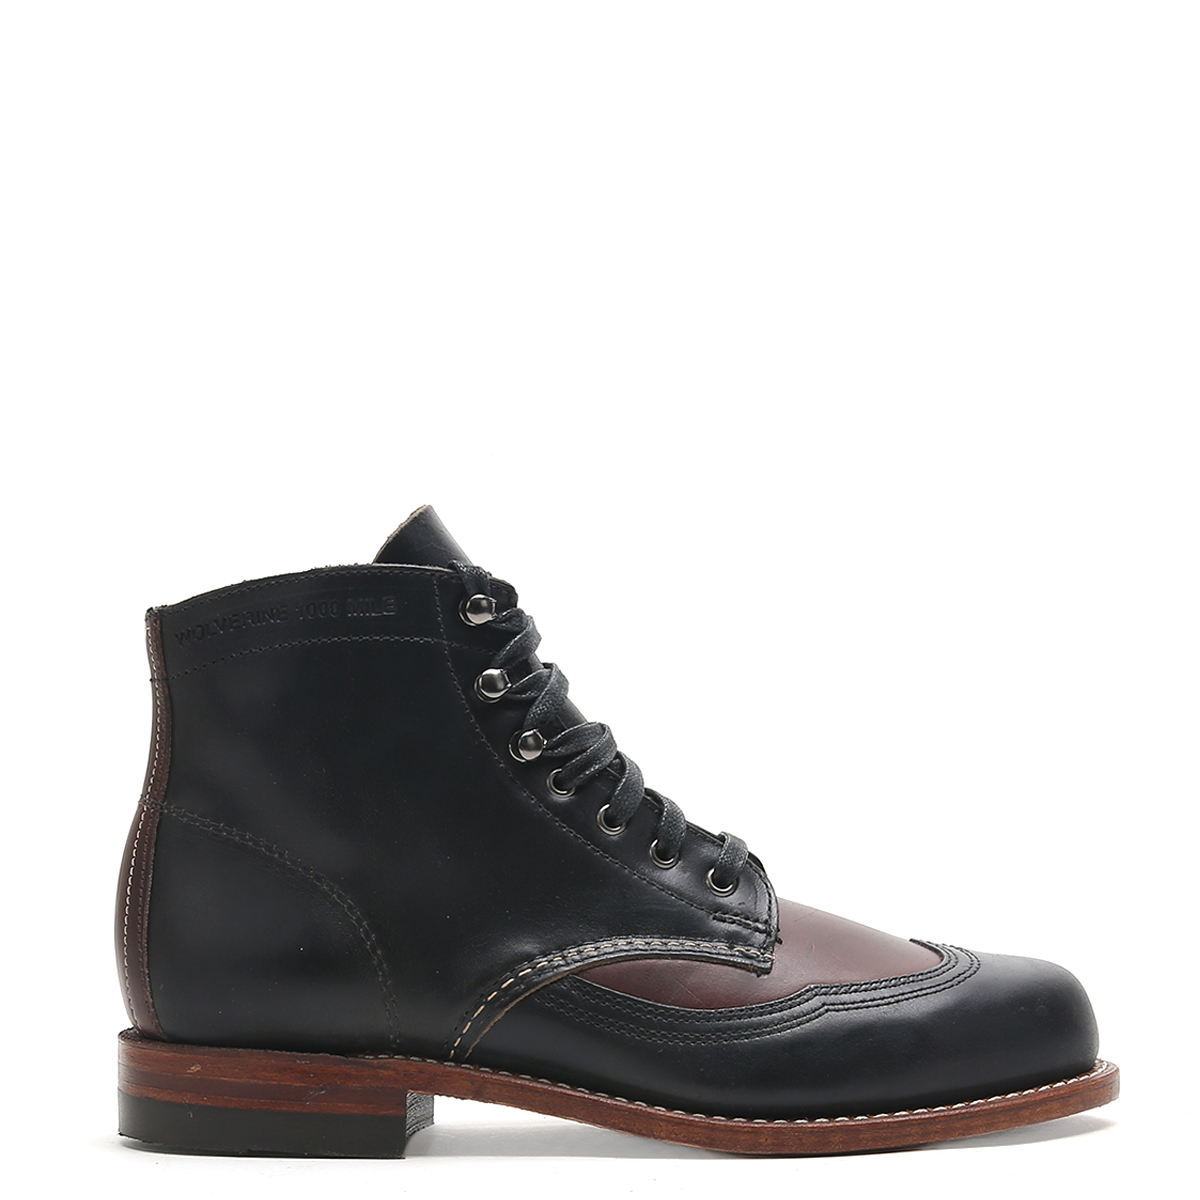 Wolverine Men's Addison 1000 Mile Boots W05947 Black Brown SZ 10.5 by